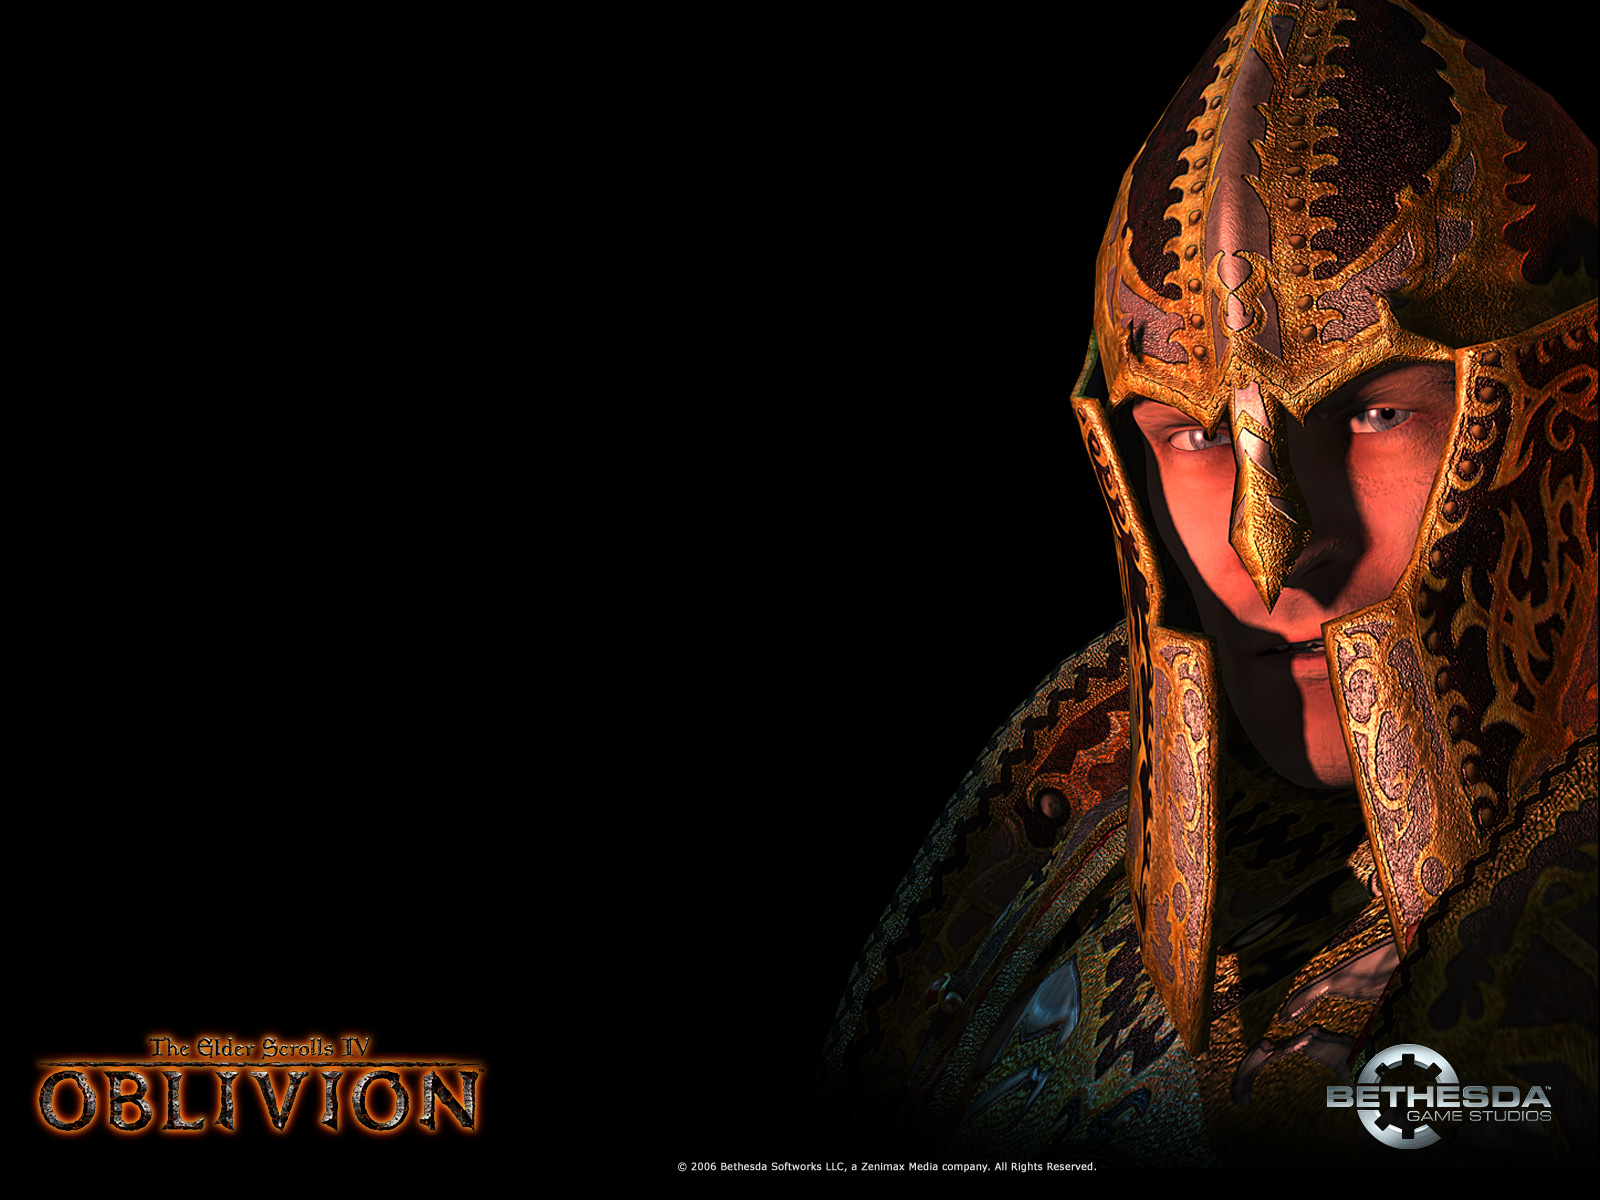 Oblivion Wallpaper - The Imperial Dragon